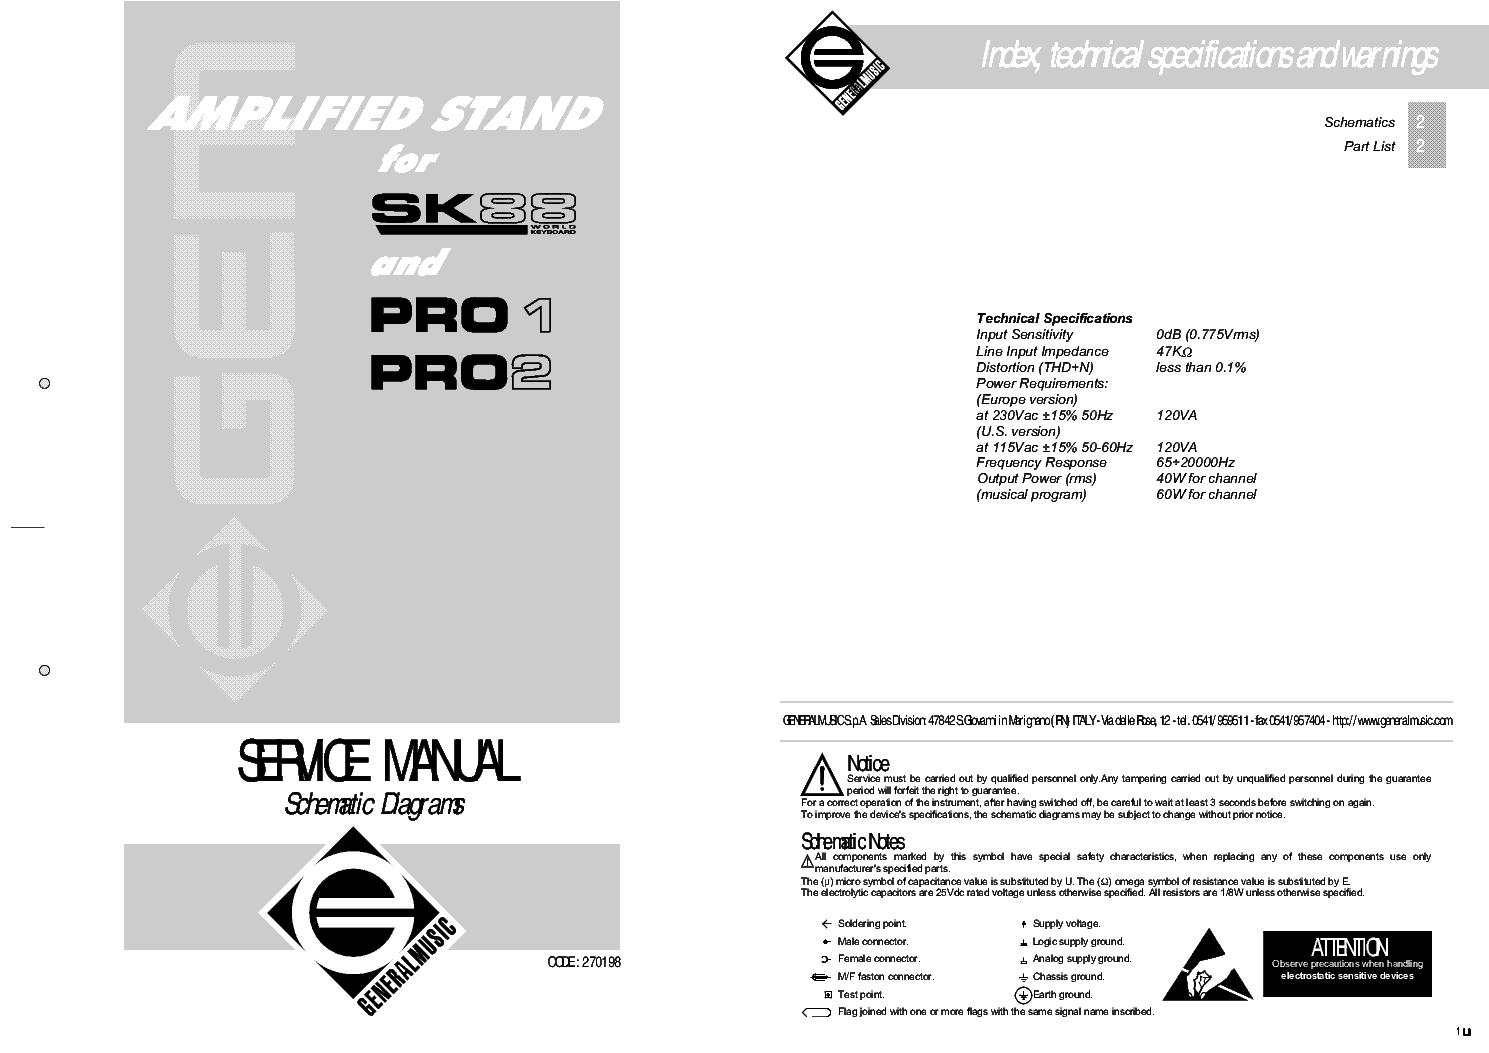 Generalmusic Amplified Stand For Sk88 Pro1 Pro2 Service Manual